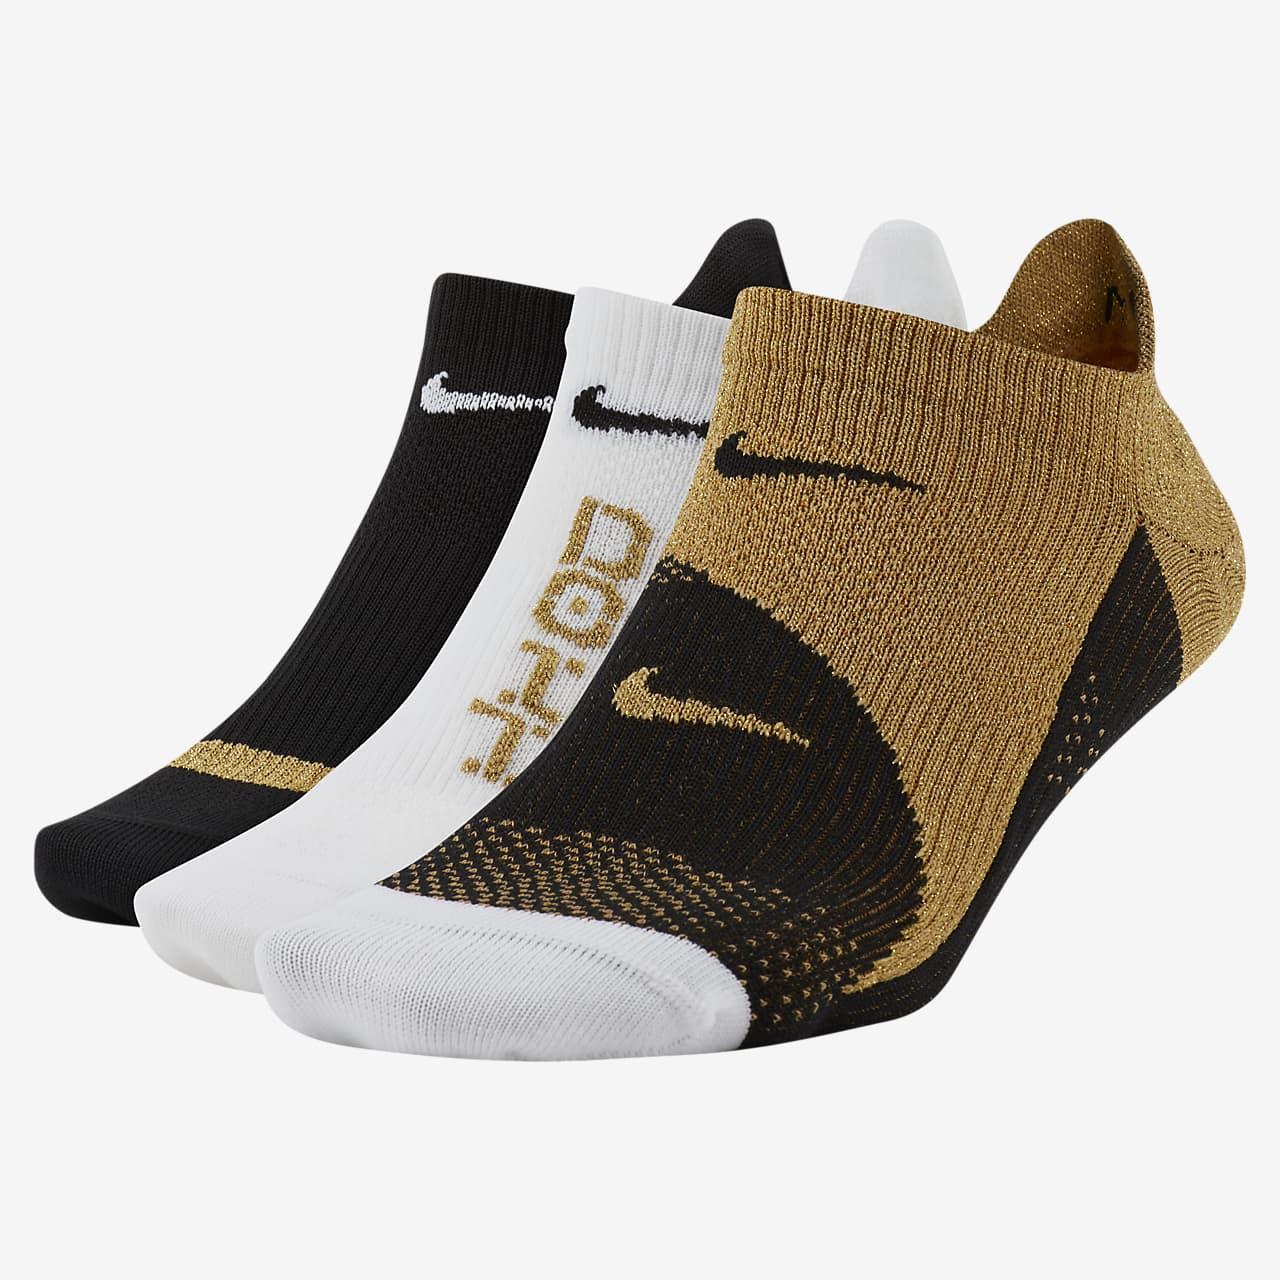 Calcetines invisibles de entrenamiento para mujer Nike Everyday Plus Lightweight (3 pares)